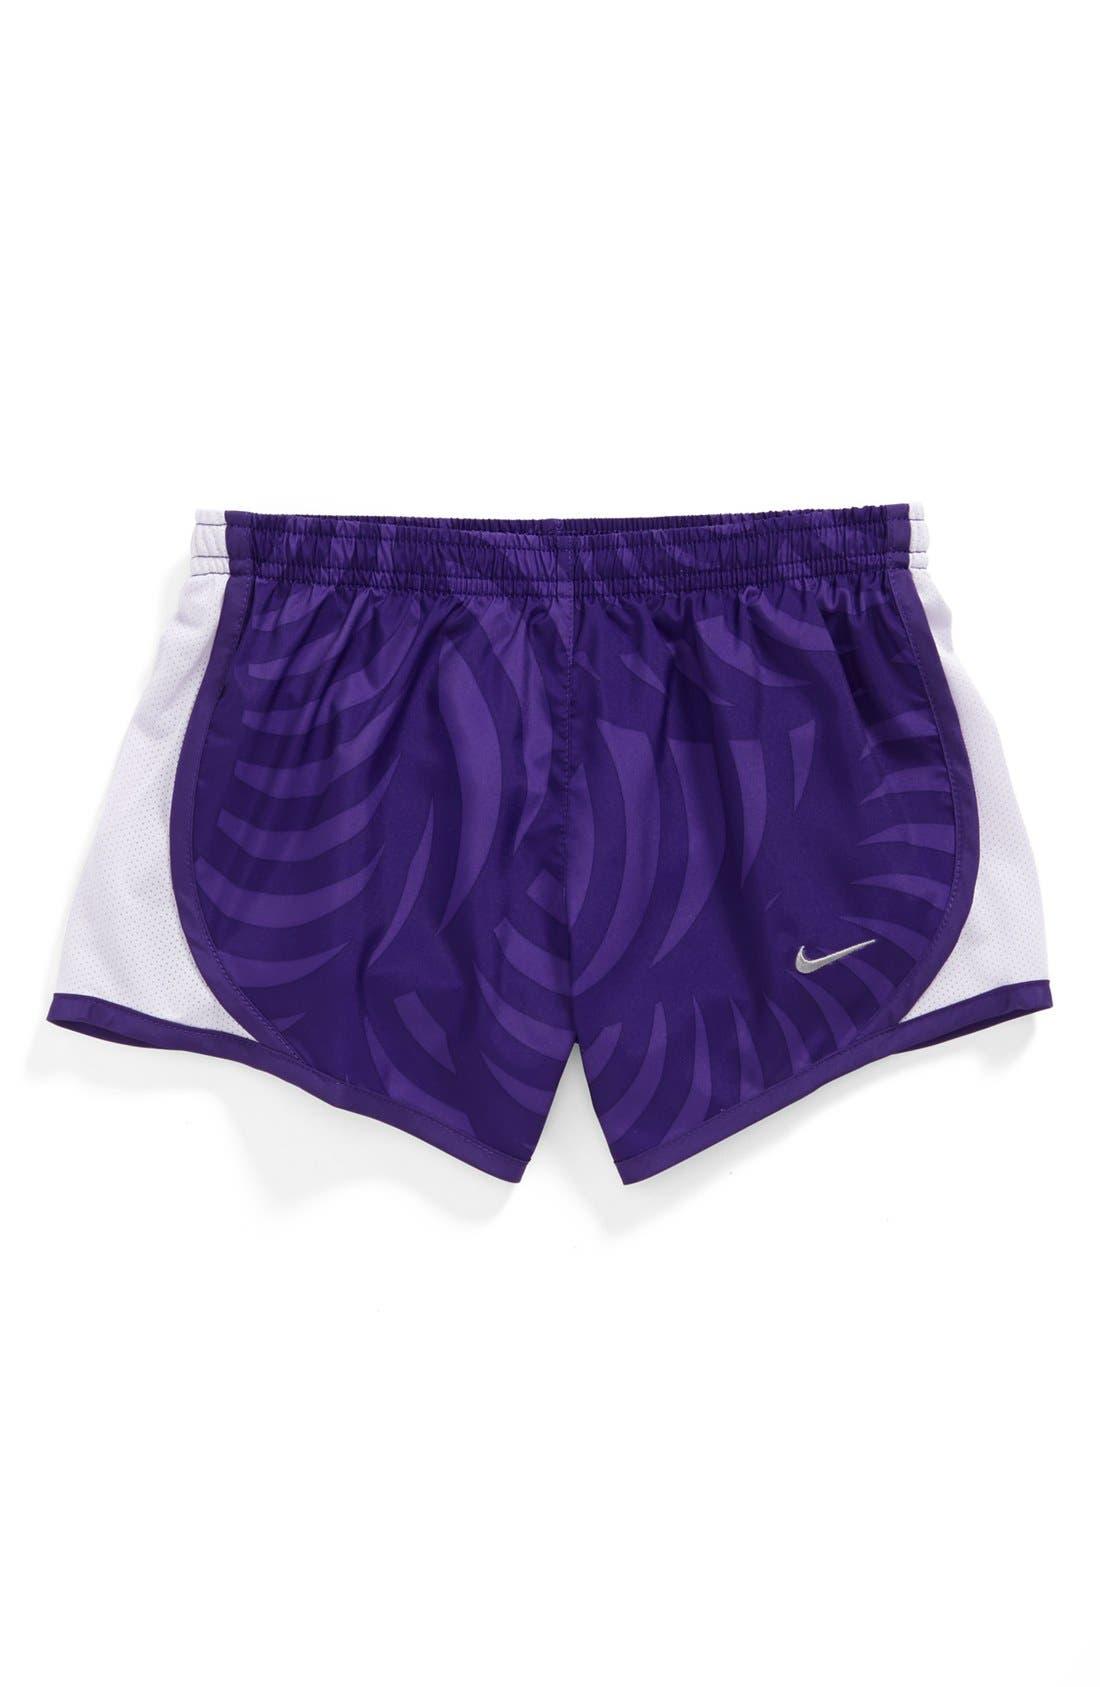 Alternate Image 1 Selected - Nike 'Tempo' Running Shorts (Little Girls & Big Girls)